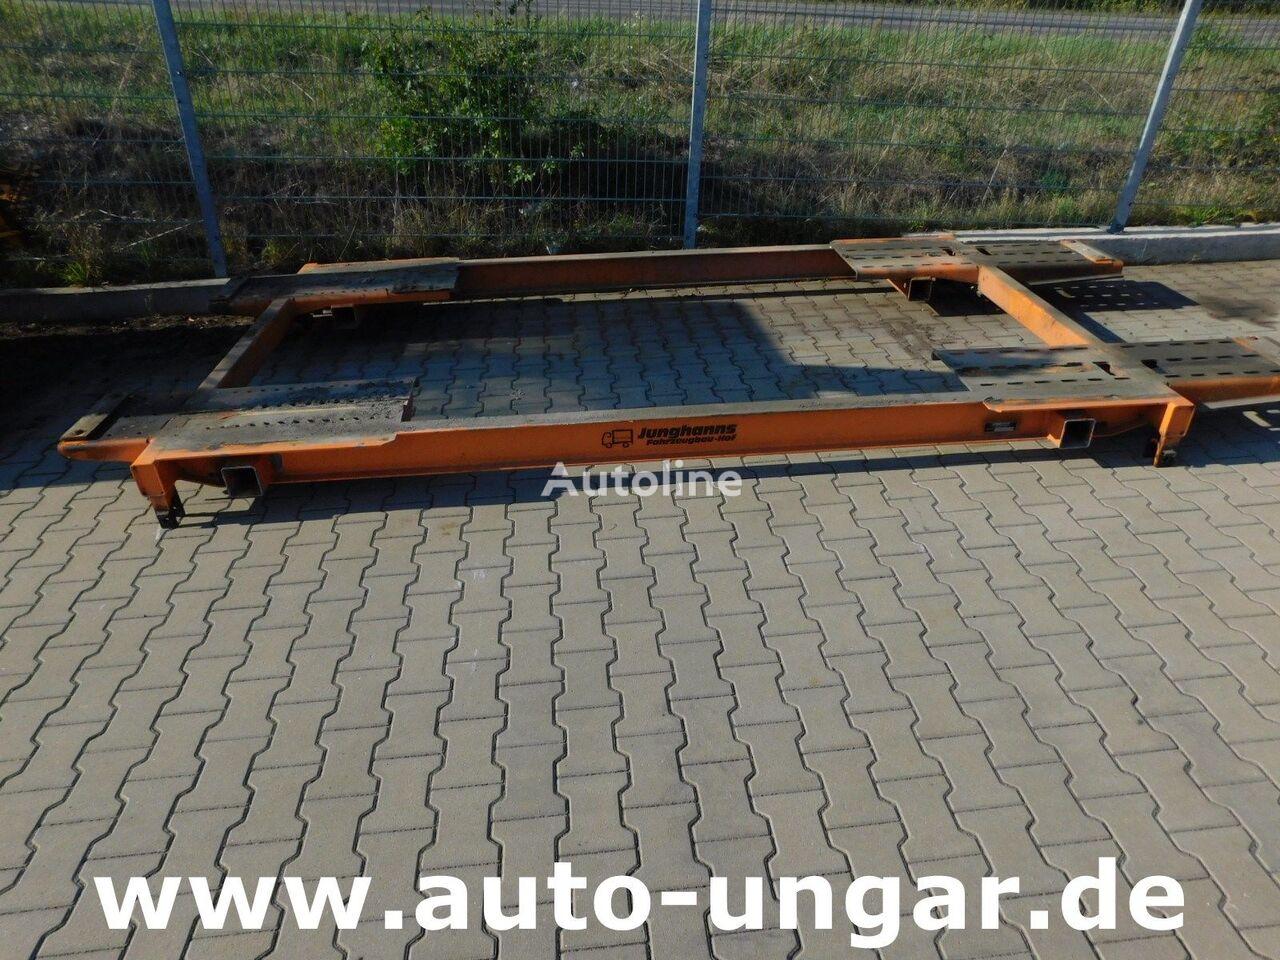 Junghans Hilfsrahmen  IVECO für LKW 3-Achser Kipper-Aufnahme other spare body part for IVECO TRAKKER truck